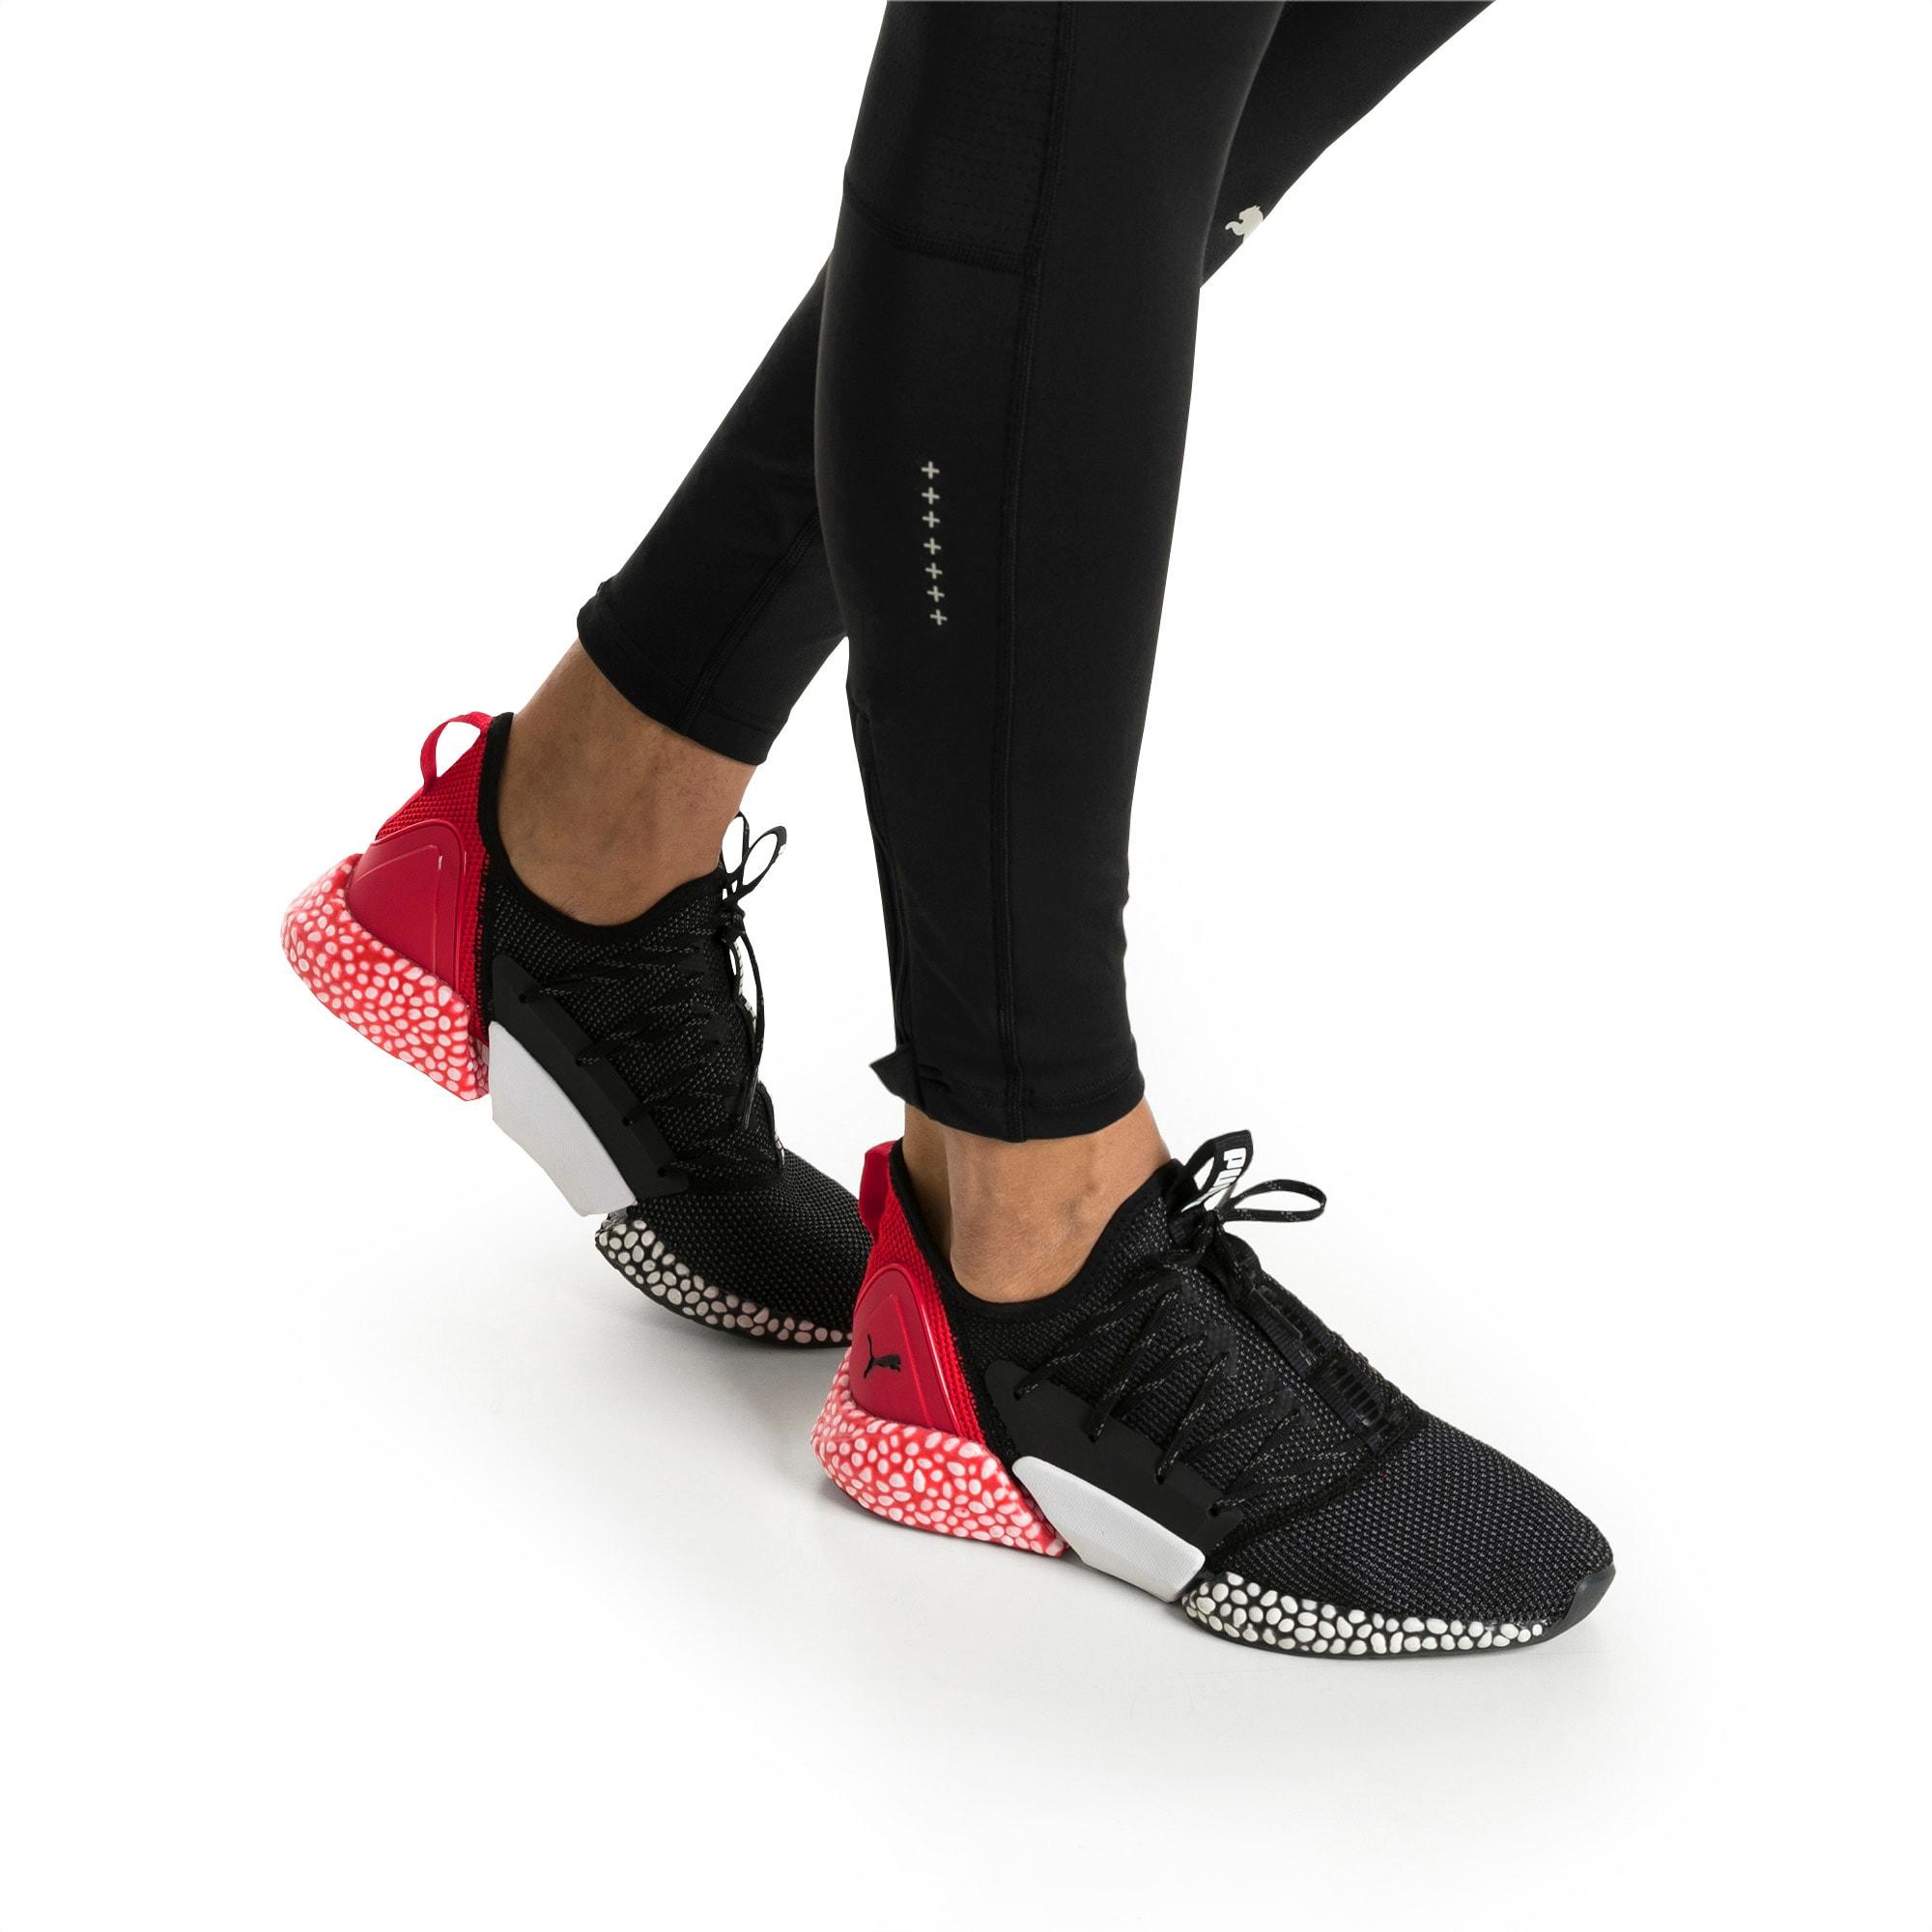 puma scarpe hybrid rocket runner